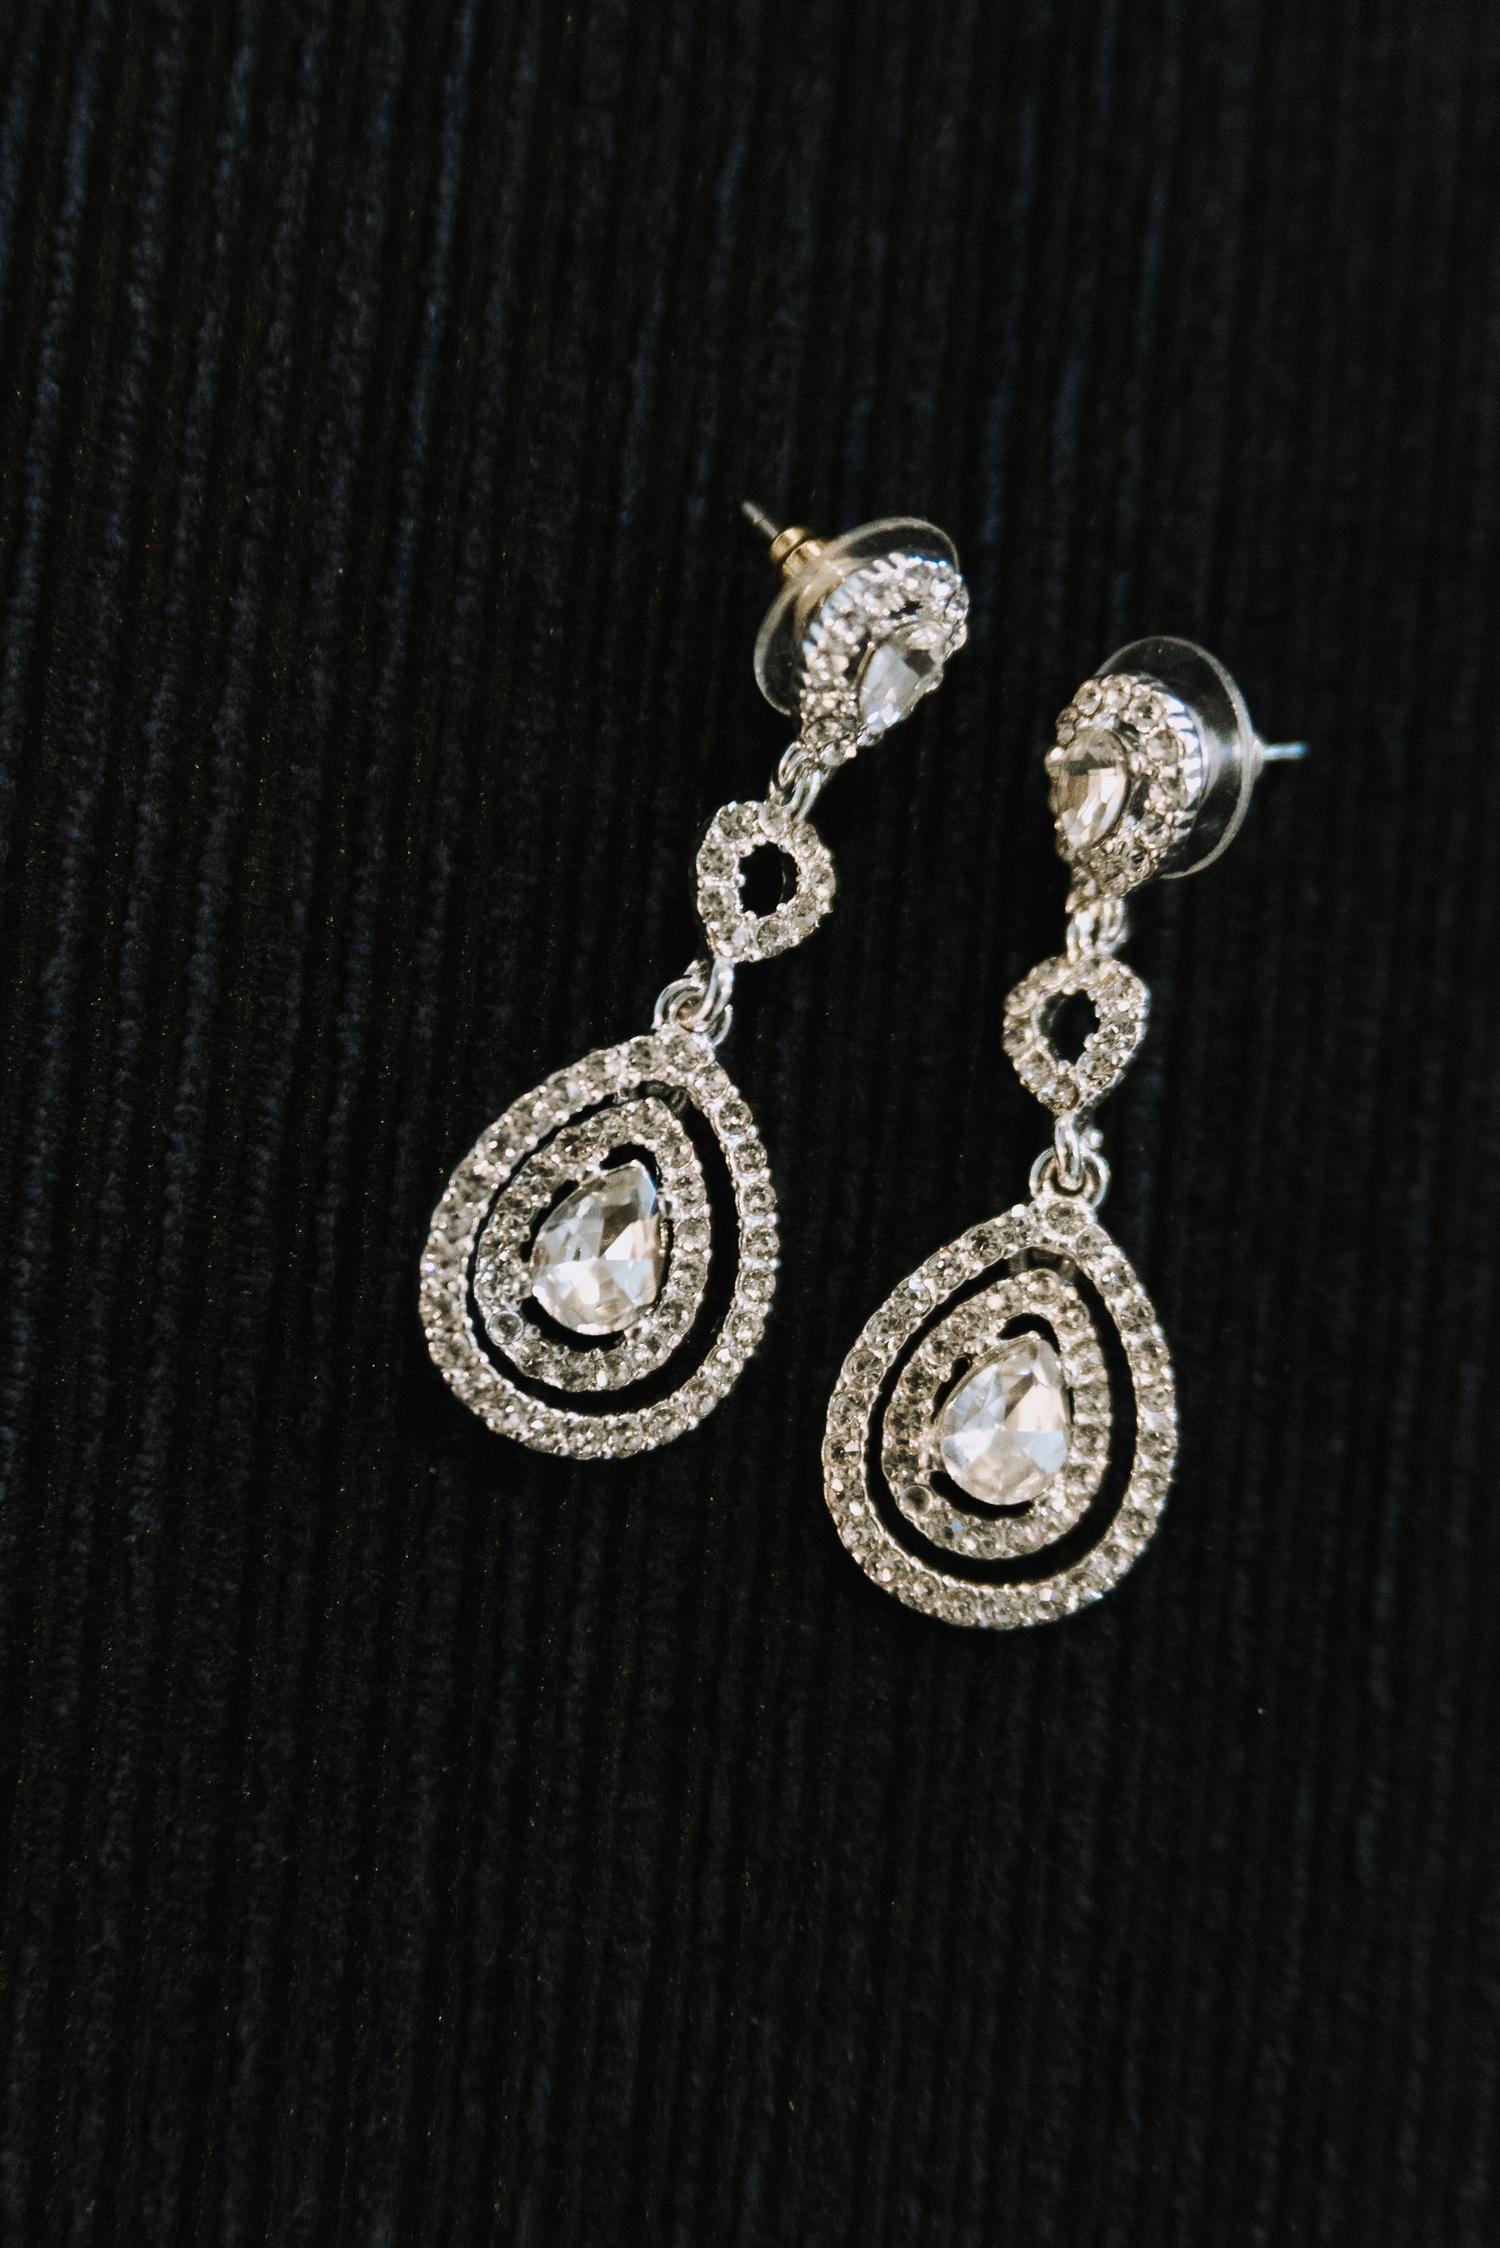 Tear Drop Bridal Earrings - Classic Indianapolis Wedding - Canal 337 Wedding - The Overwhelmed Bride Wedding Blog